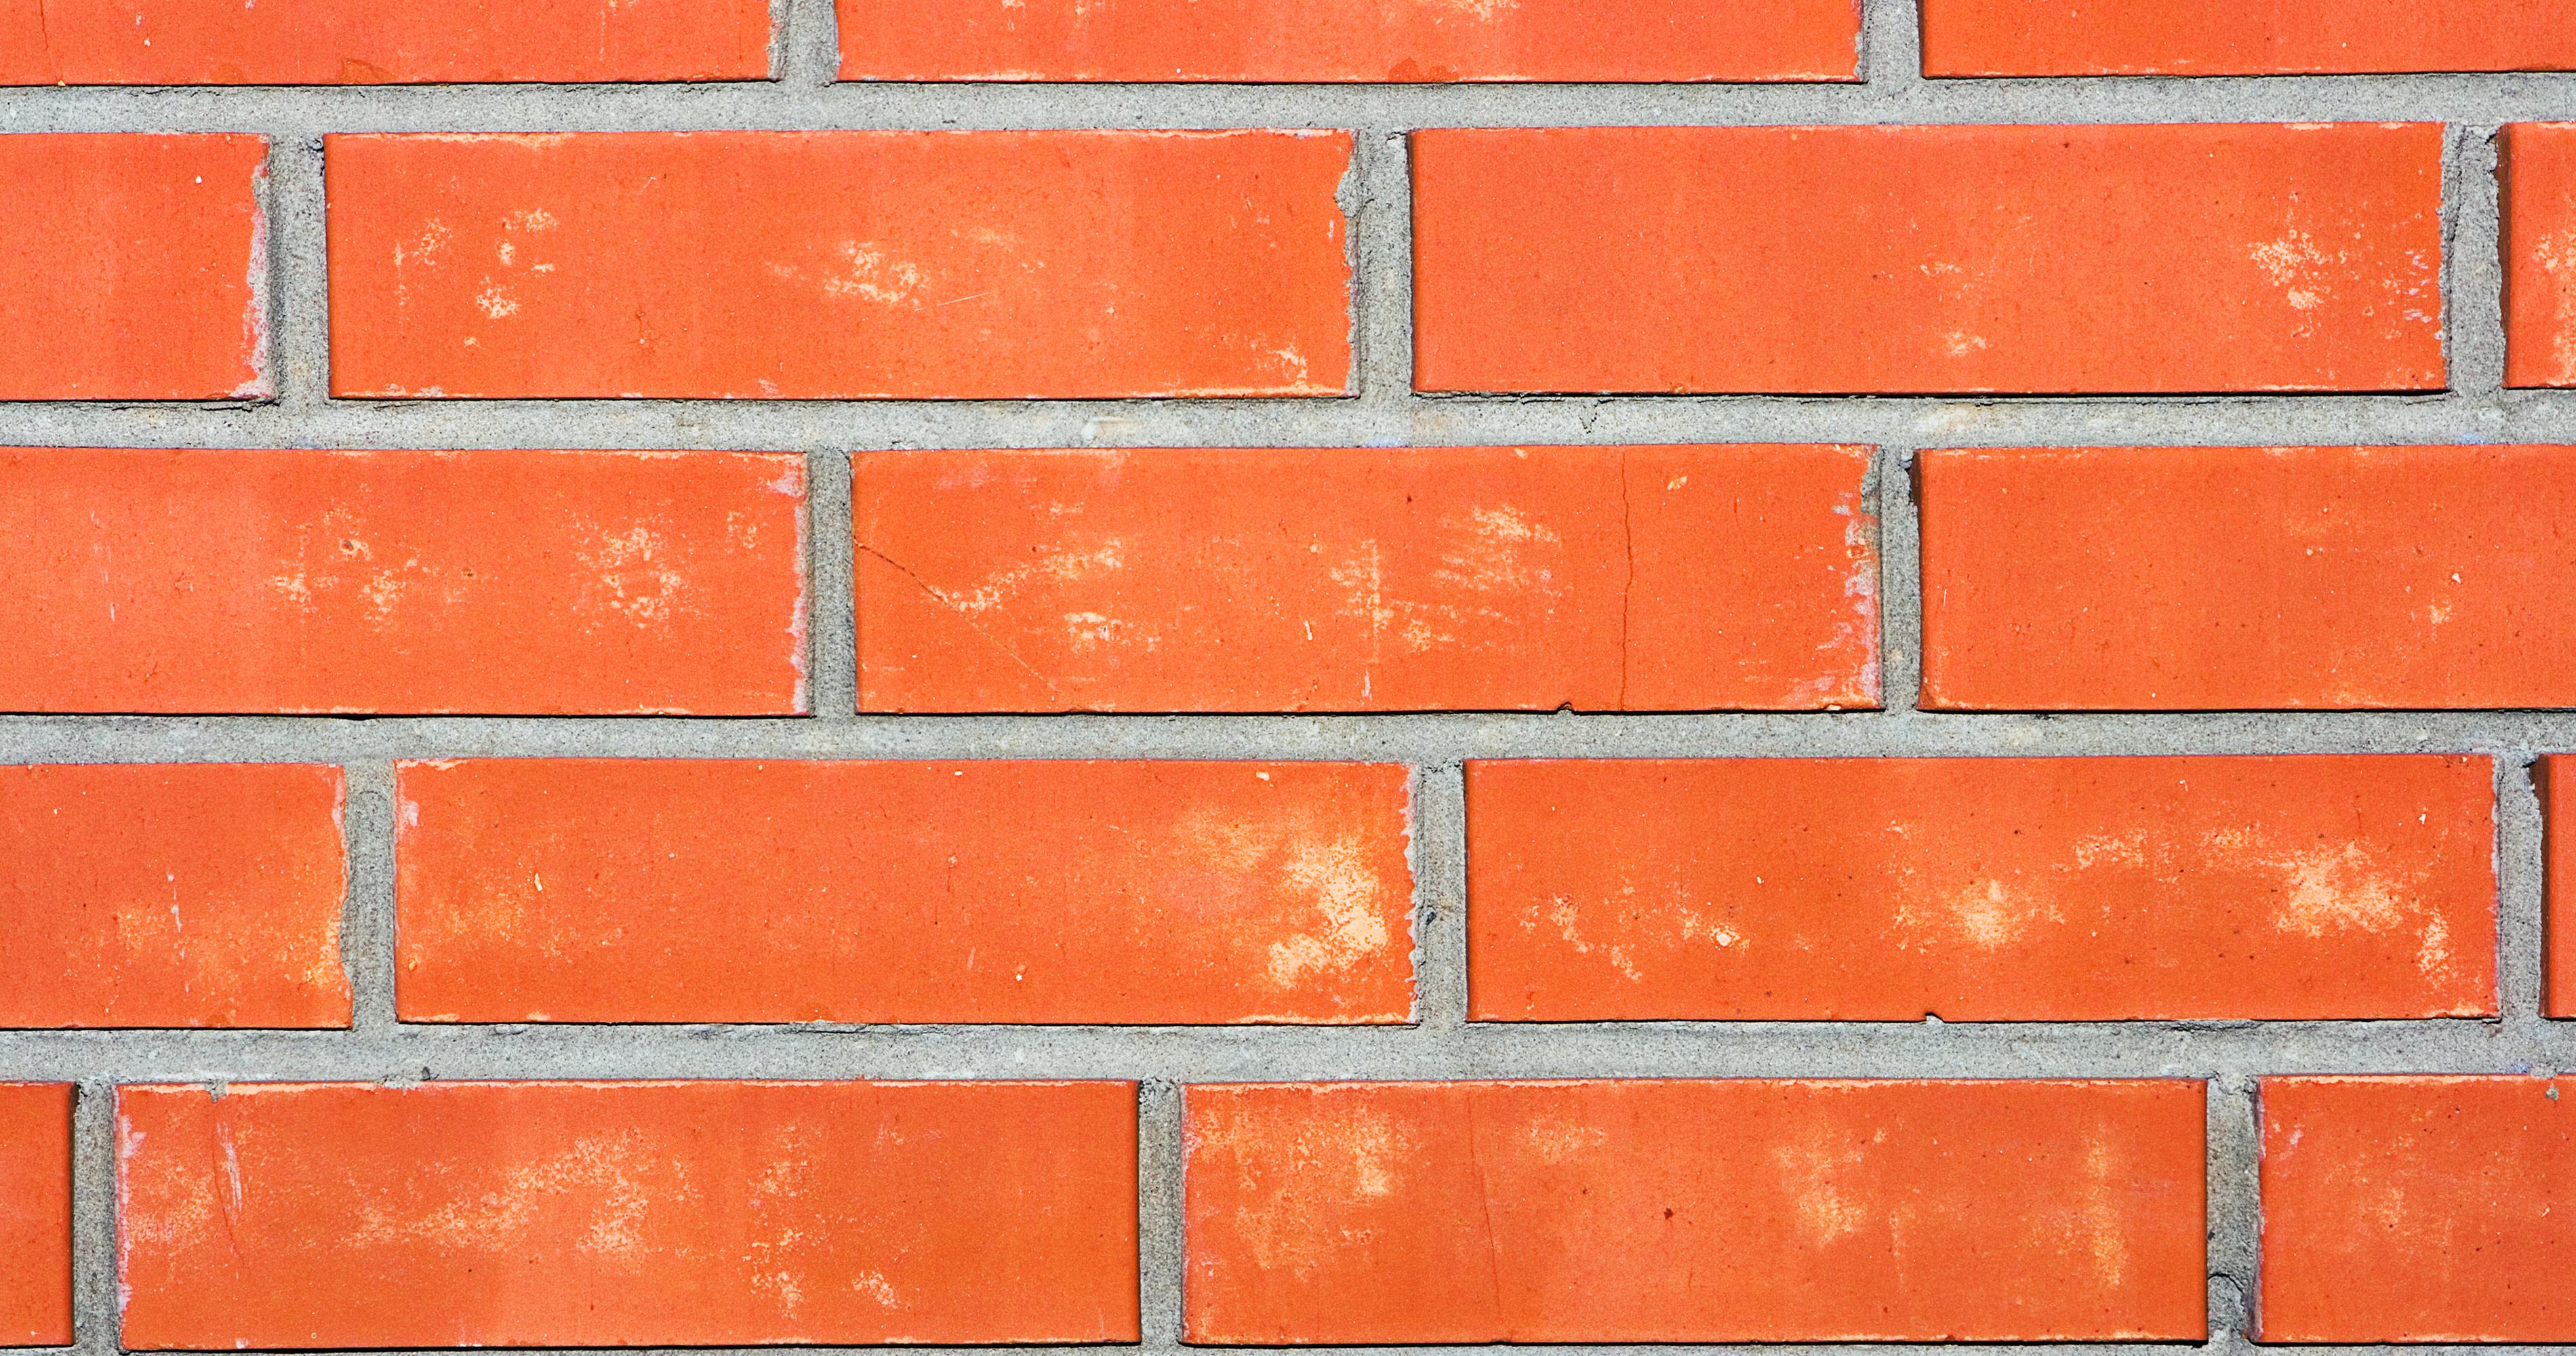 wall, Backgrounds, Blocks, Blotch, Bricks, HQ Photo